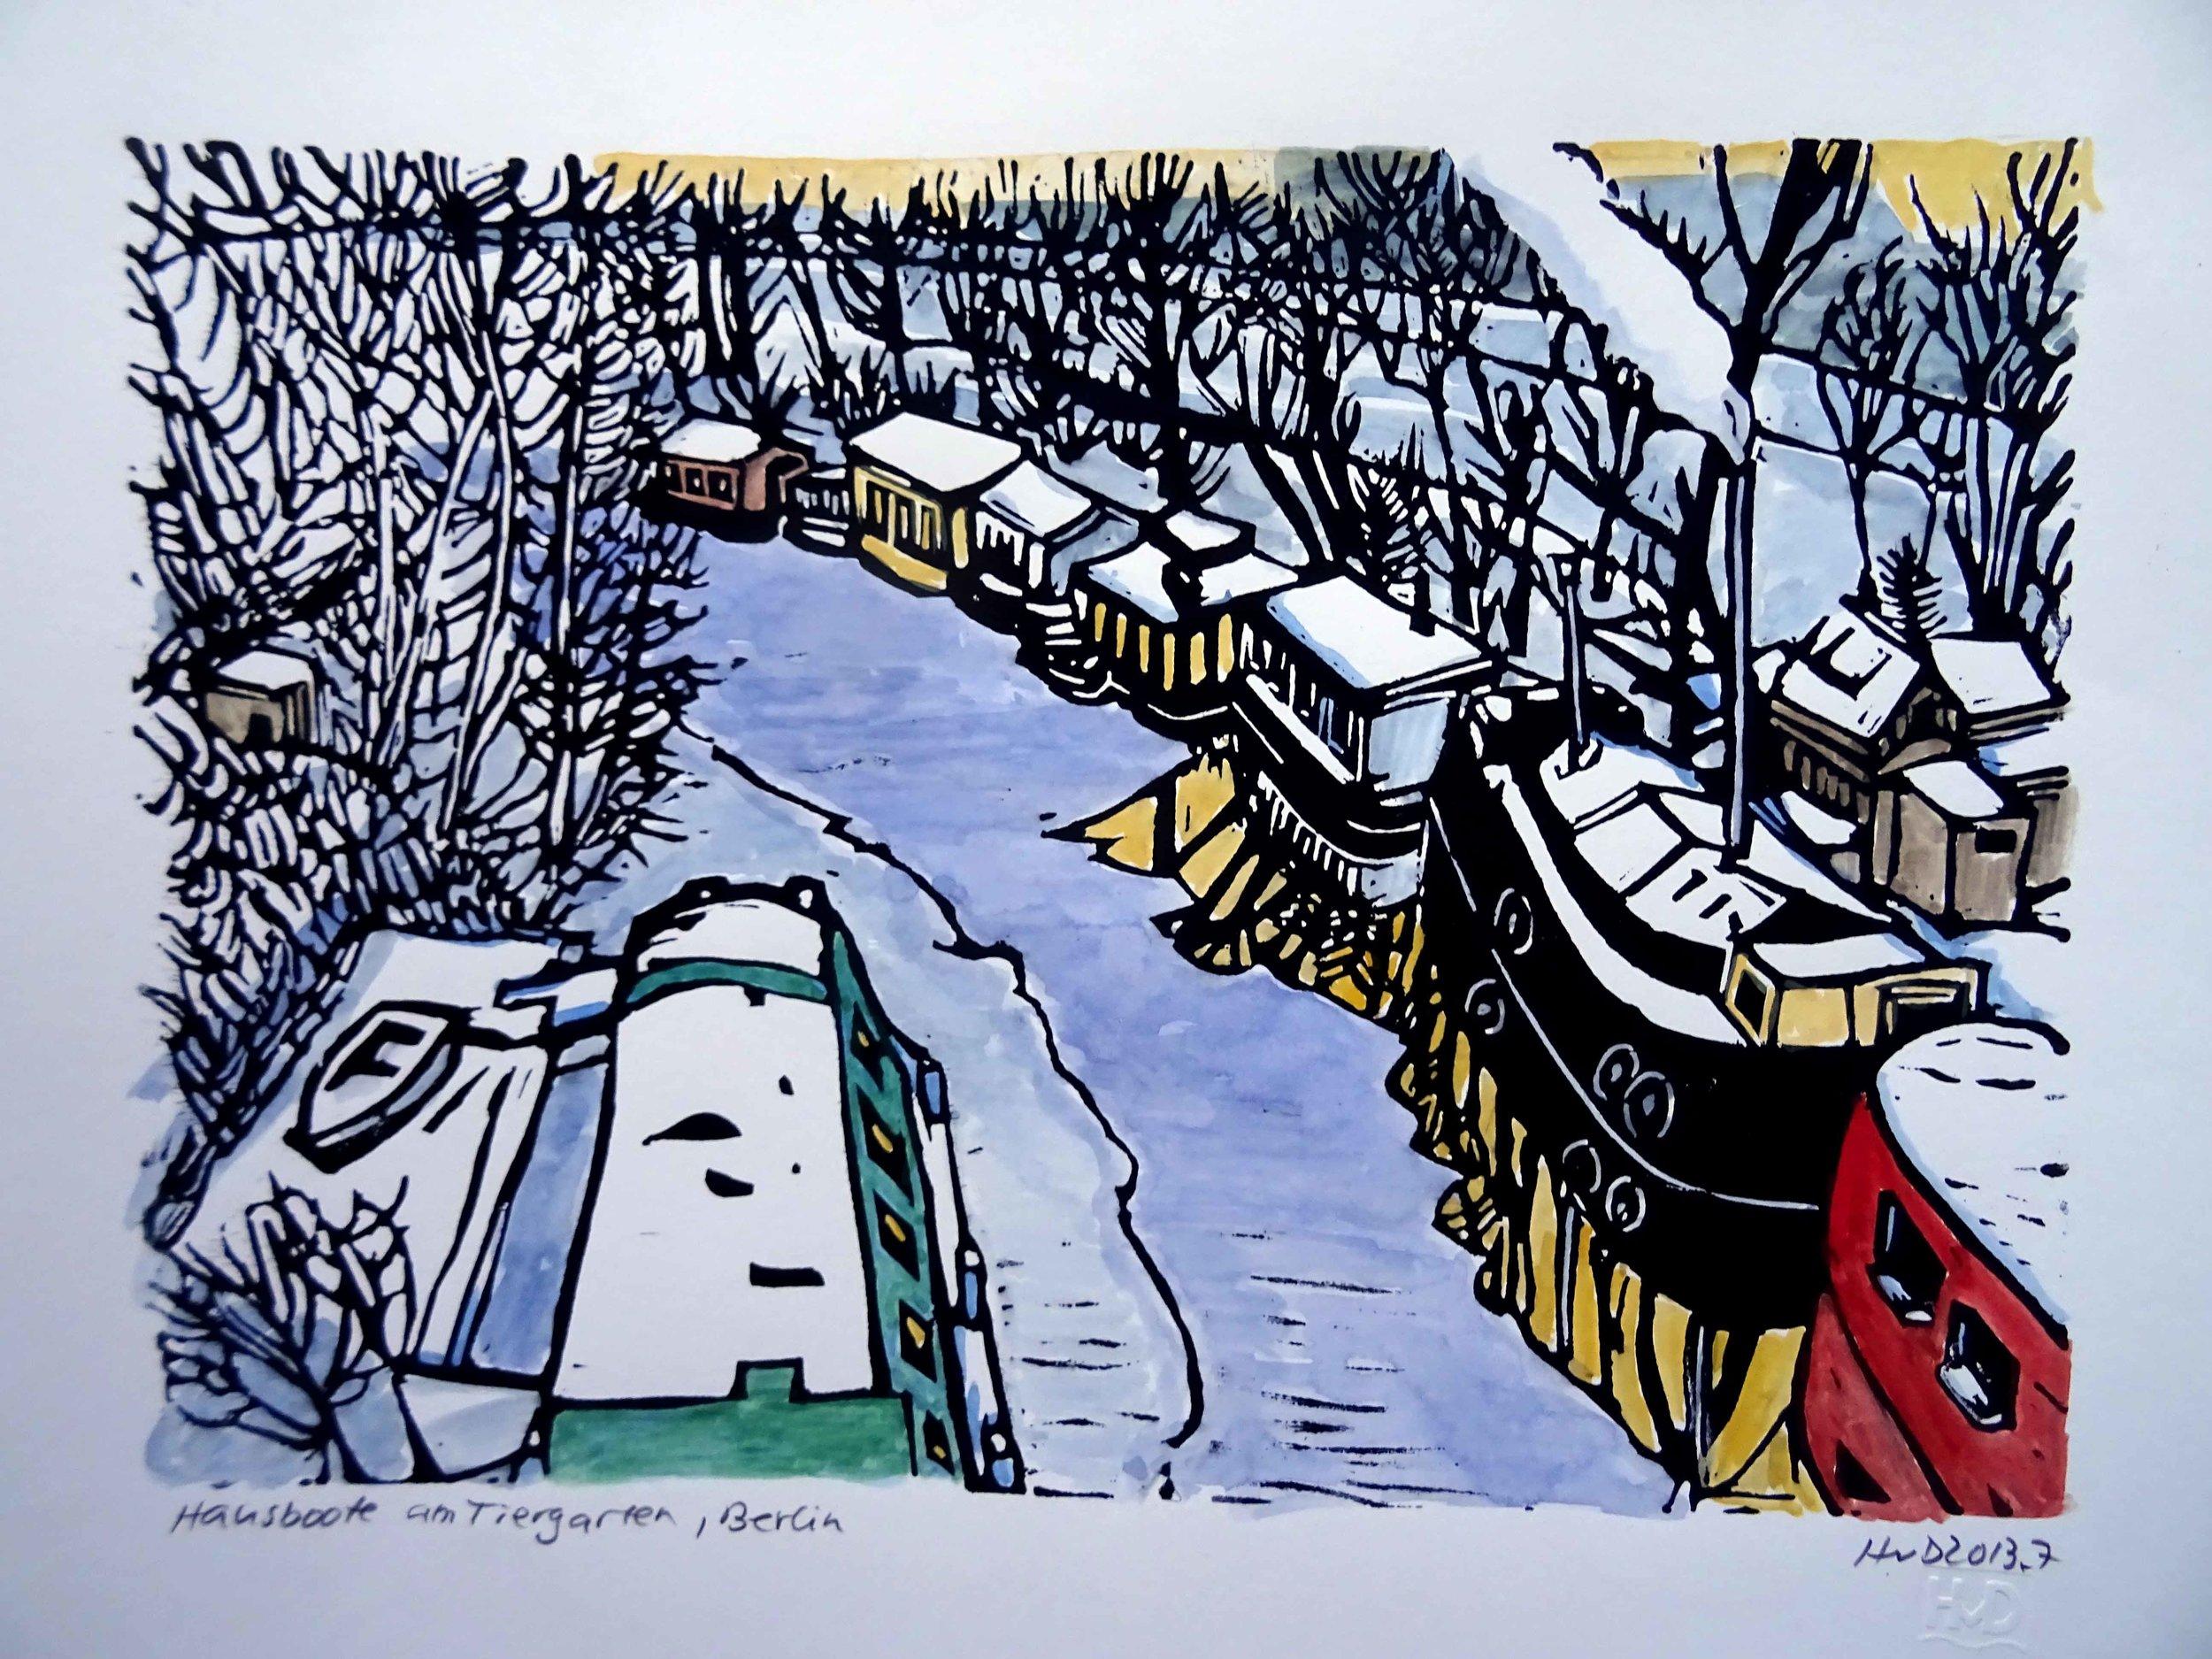 122 - Hausboote am Tiergarten, painted lino 21x30 cm, 80 €